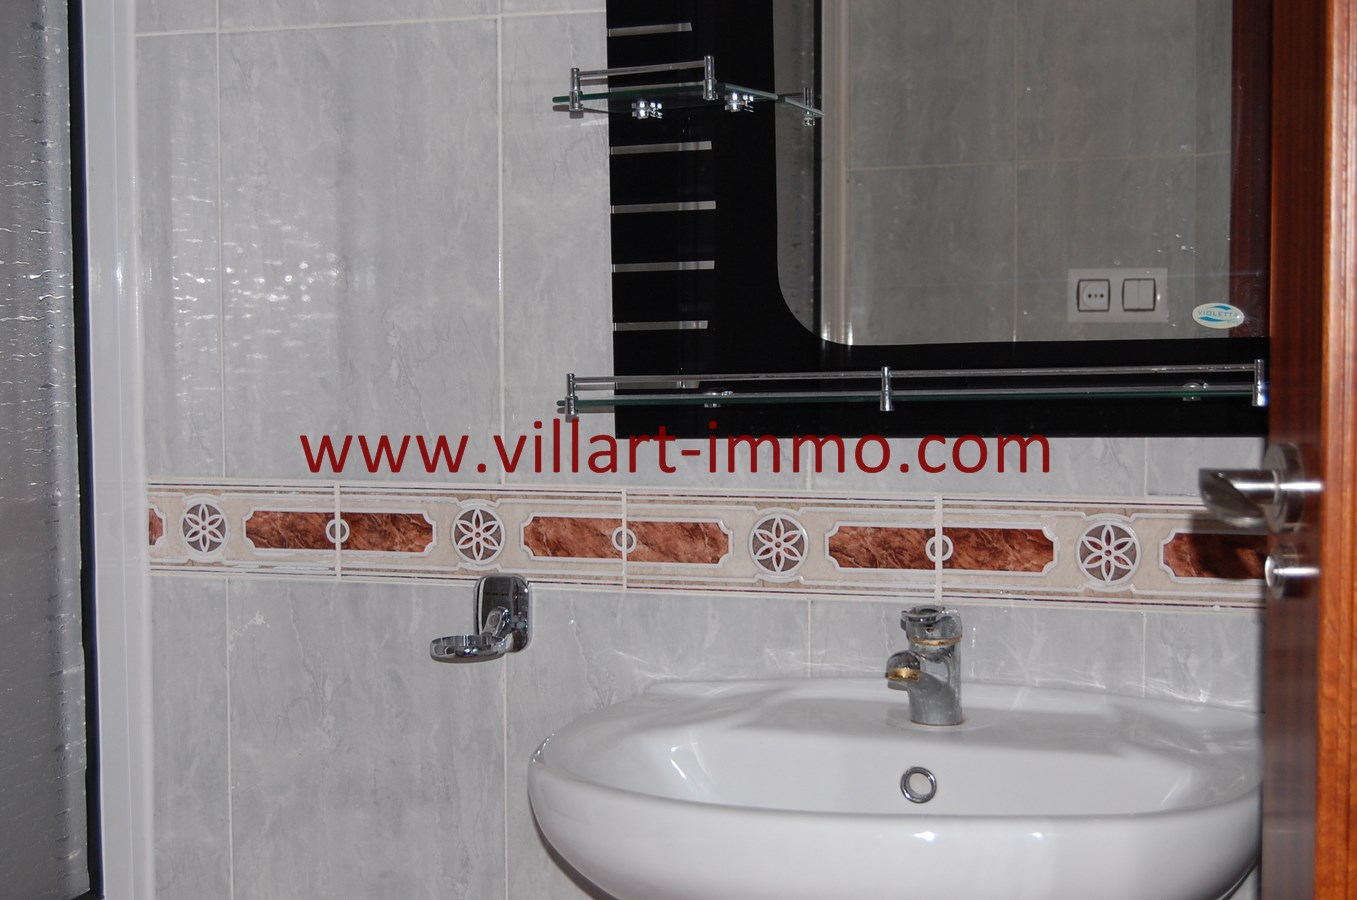 5-Vente-Appartement-Tanger-Malabata-Salle de Bain-VA486-Villart Immo